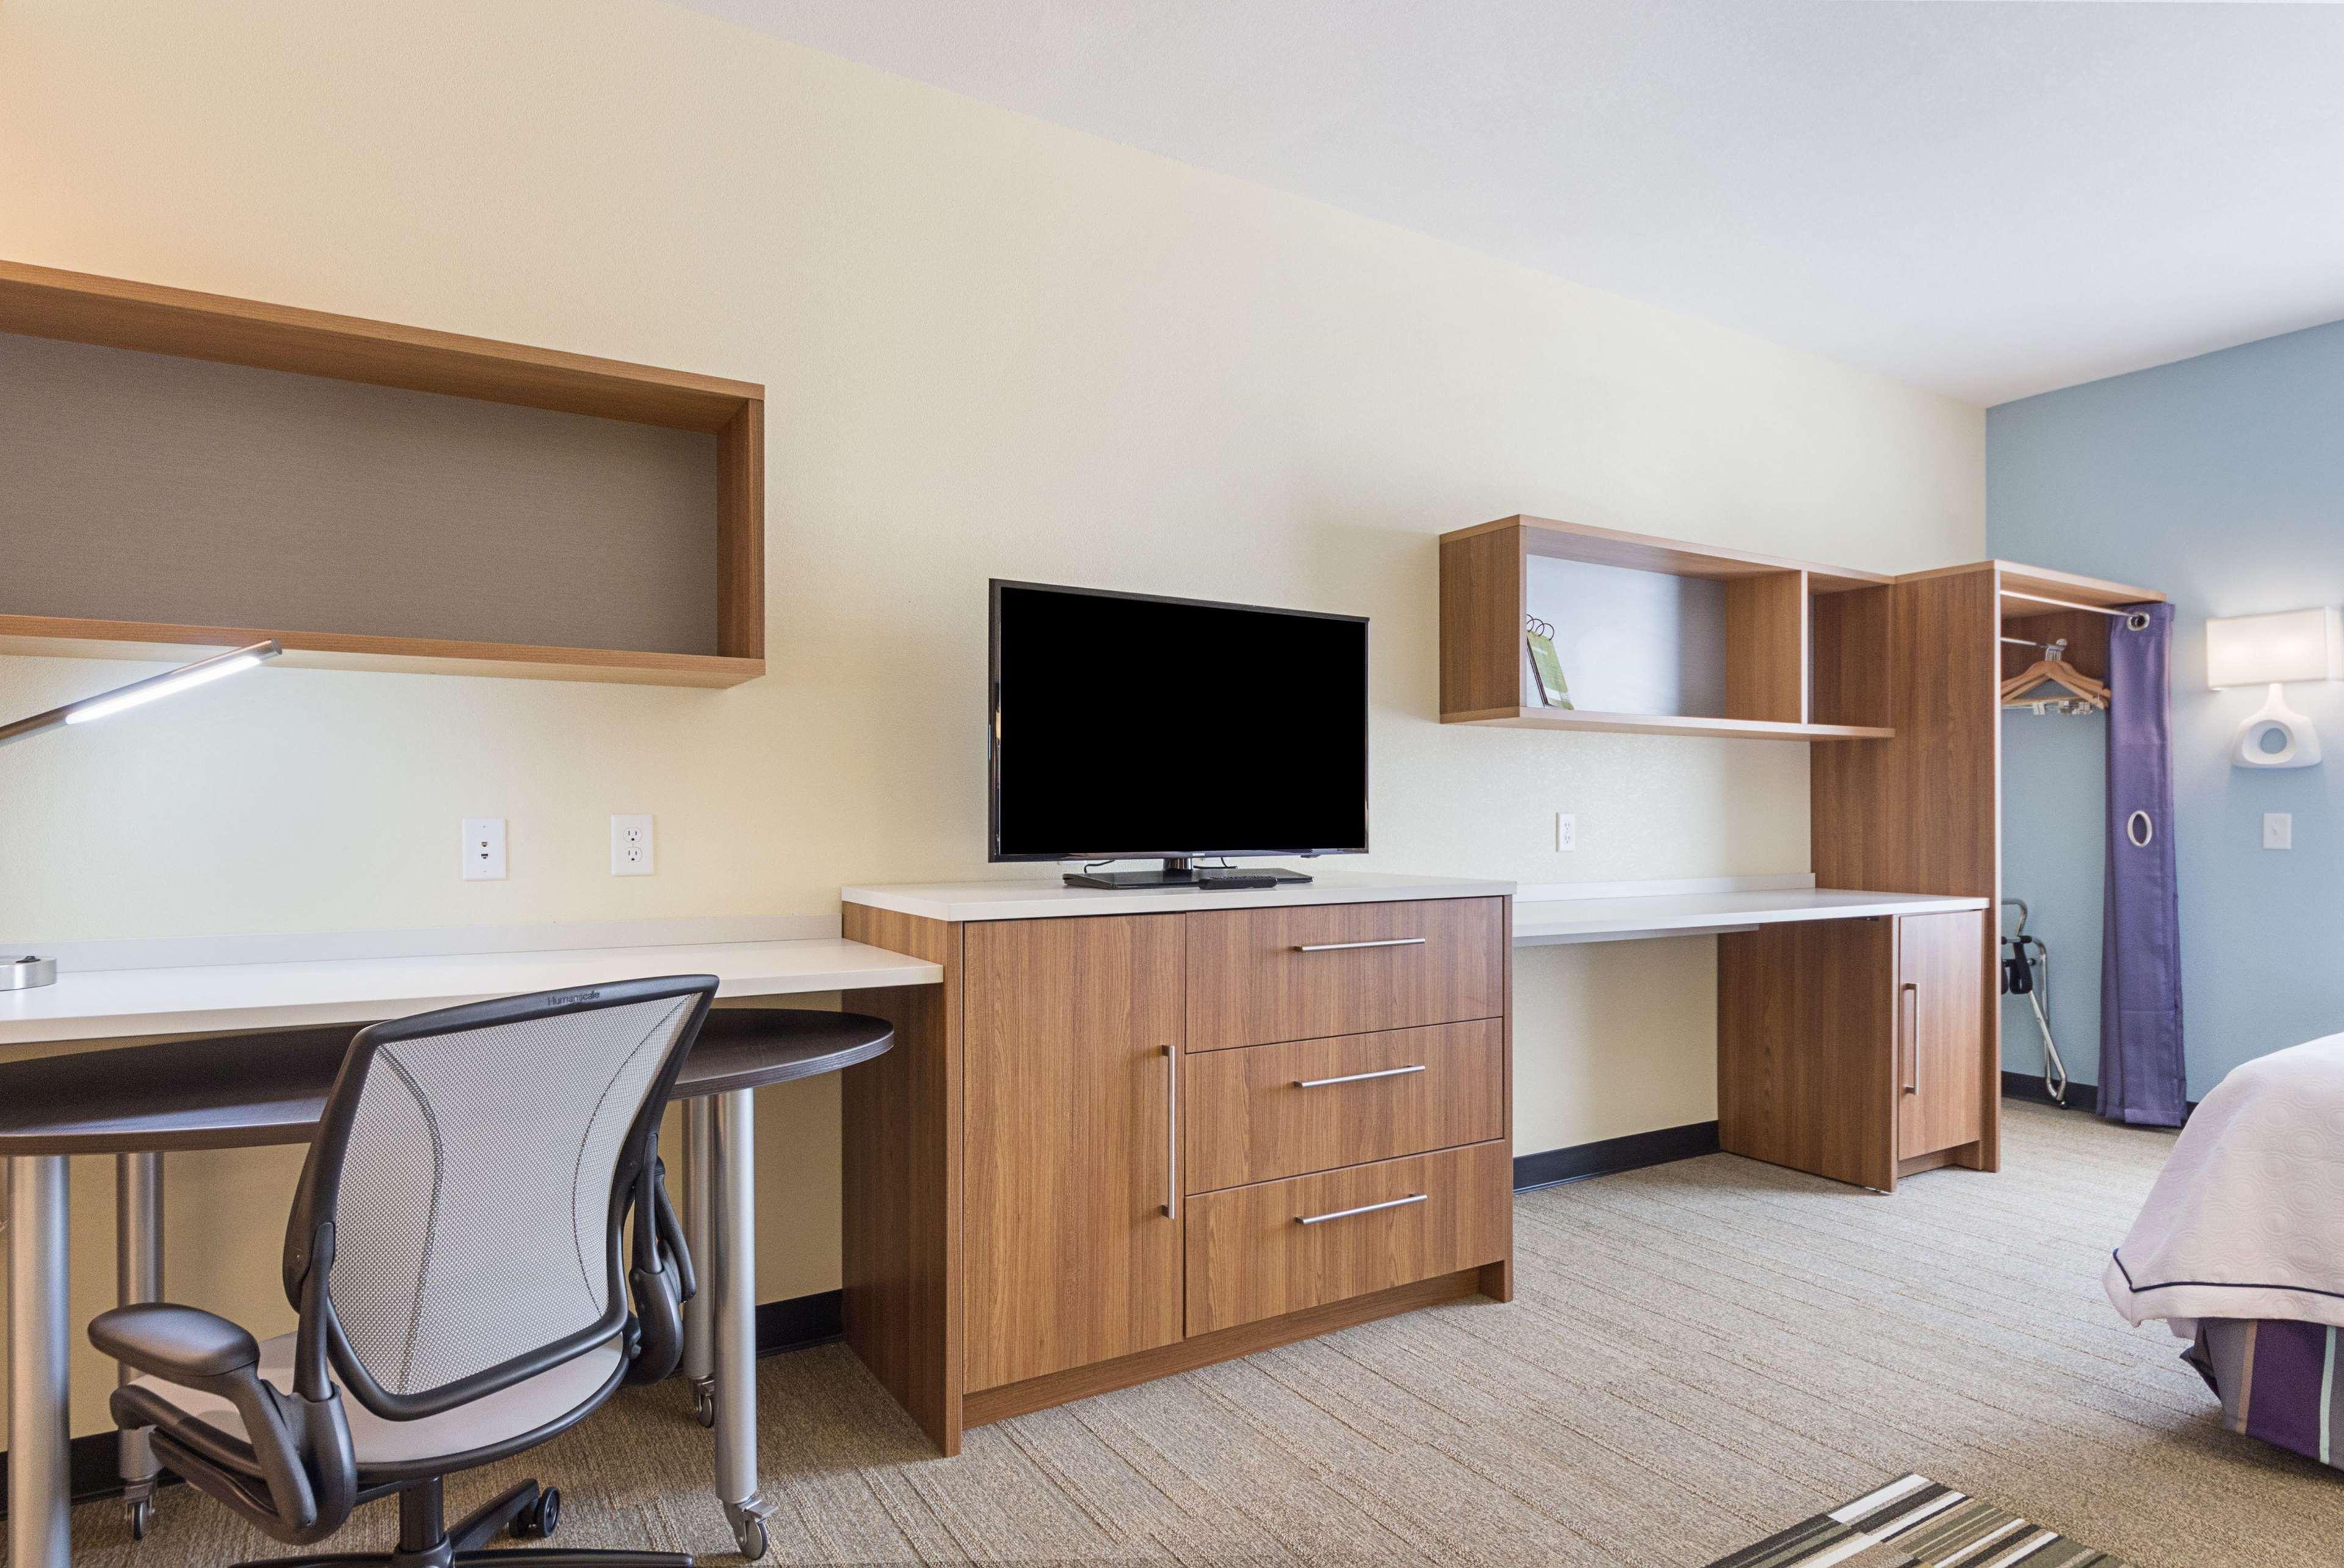 Home 2 Suites by Hilton - Yukon image 36